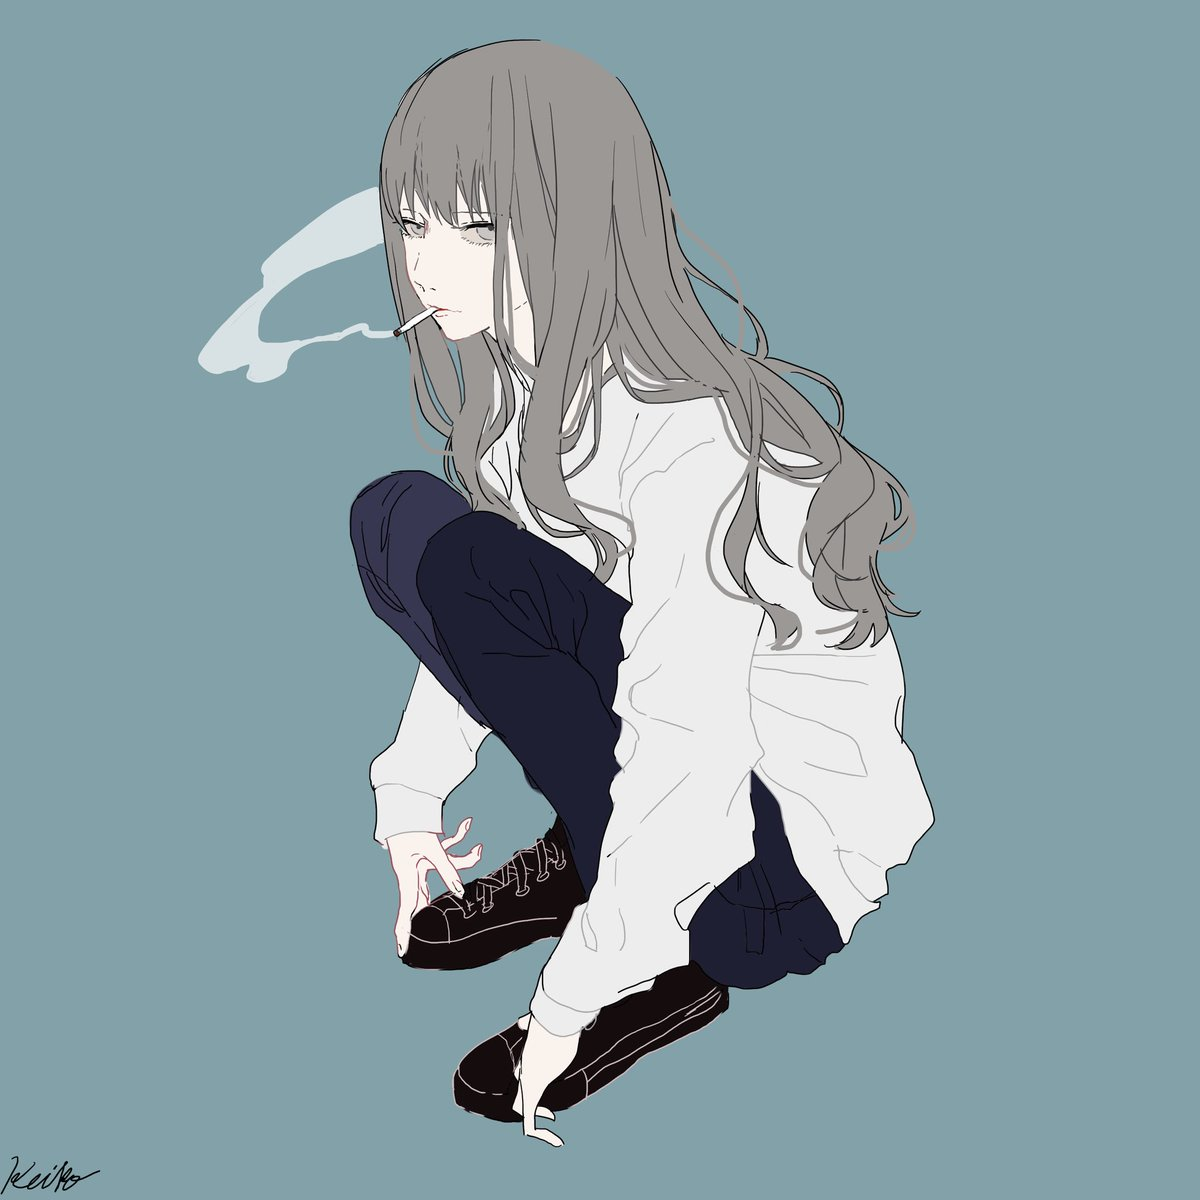 "etopica(エトピカ) on twitter: ""たばこを吸っている女性はどこか魅力"